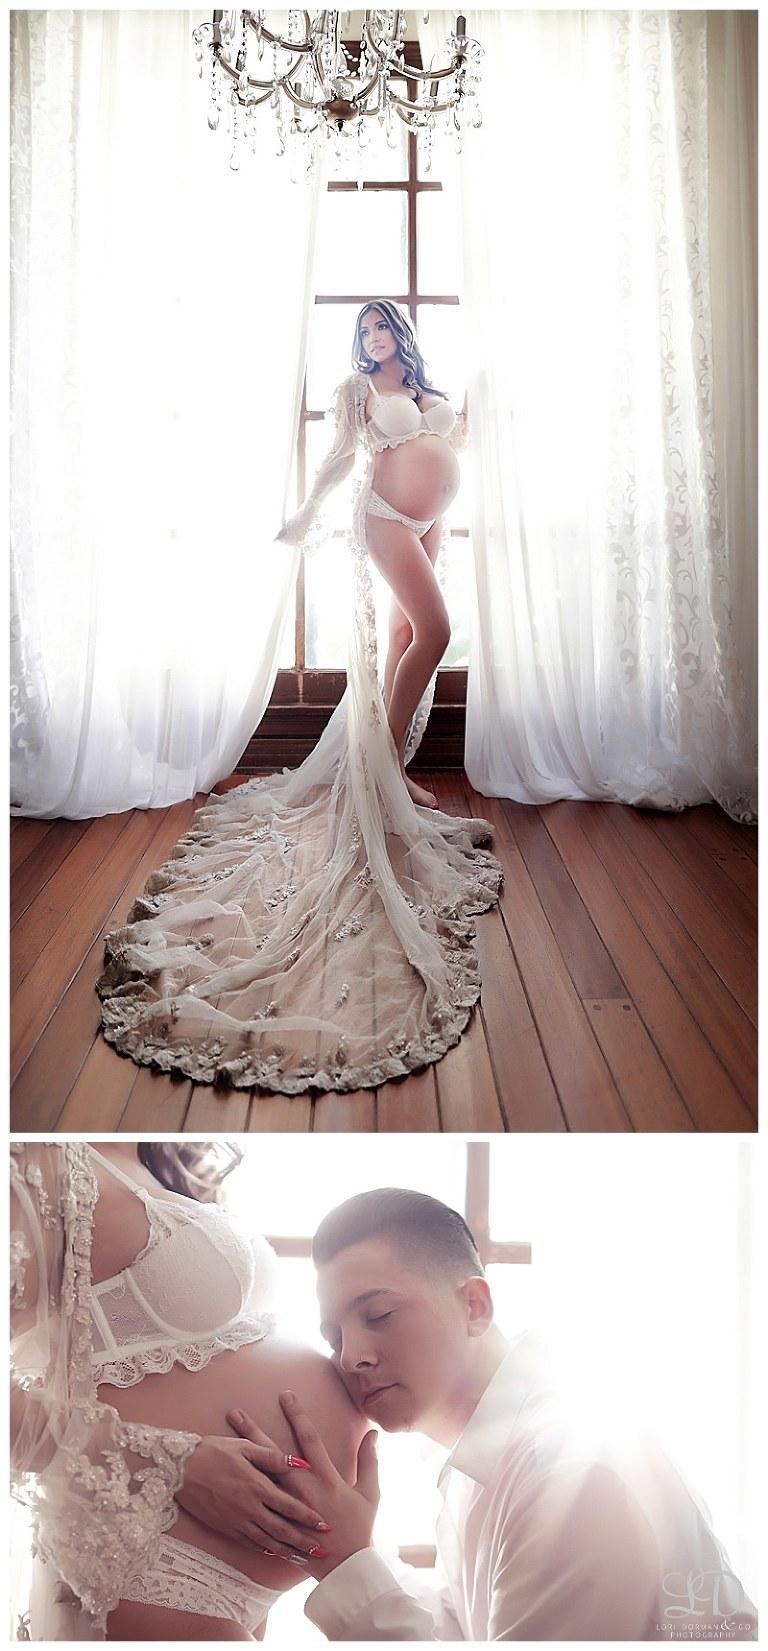 sweet maternity photoshoot-lori dorman photography-maternity boudoir-professional photographer_5842.jpg